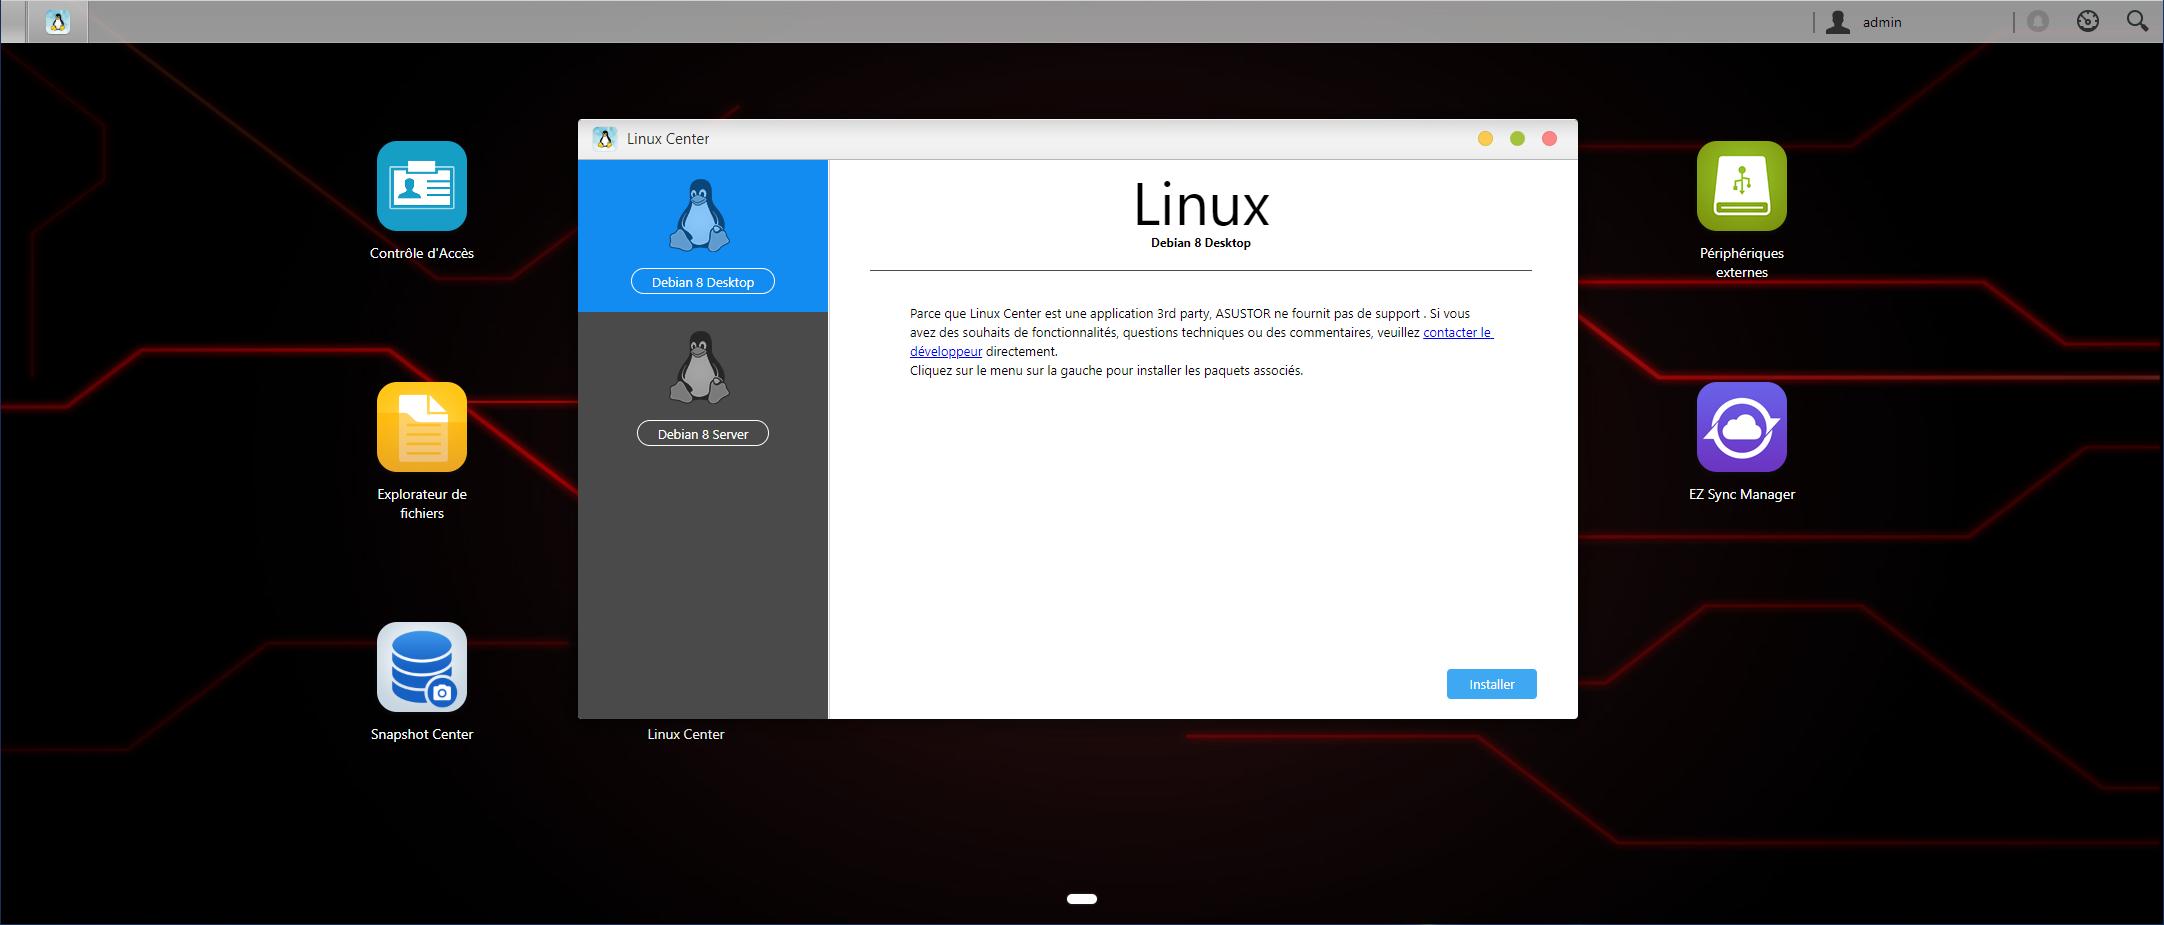 Asustor ADM 3.4 Linux Center